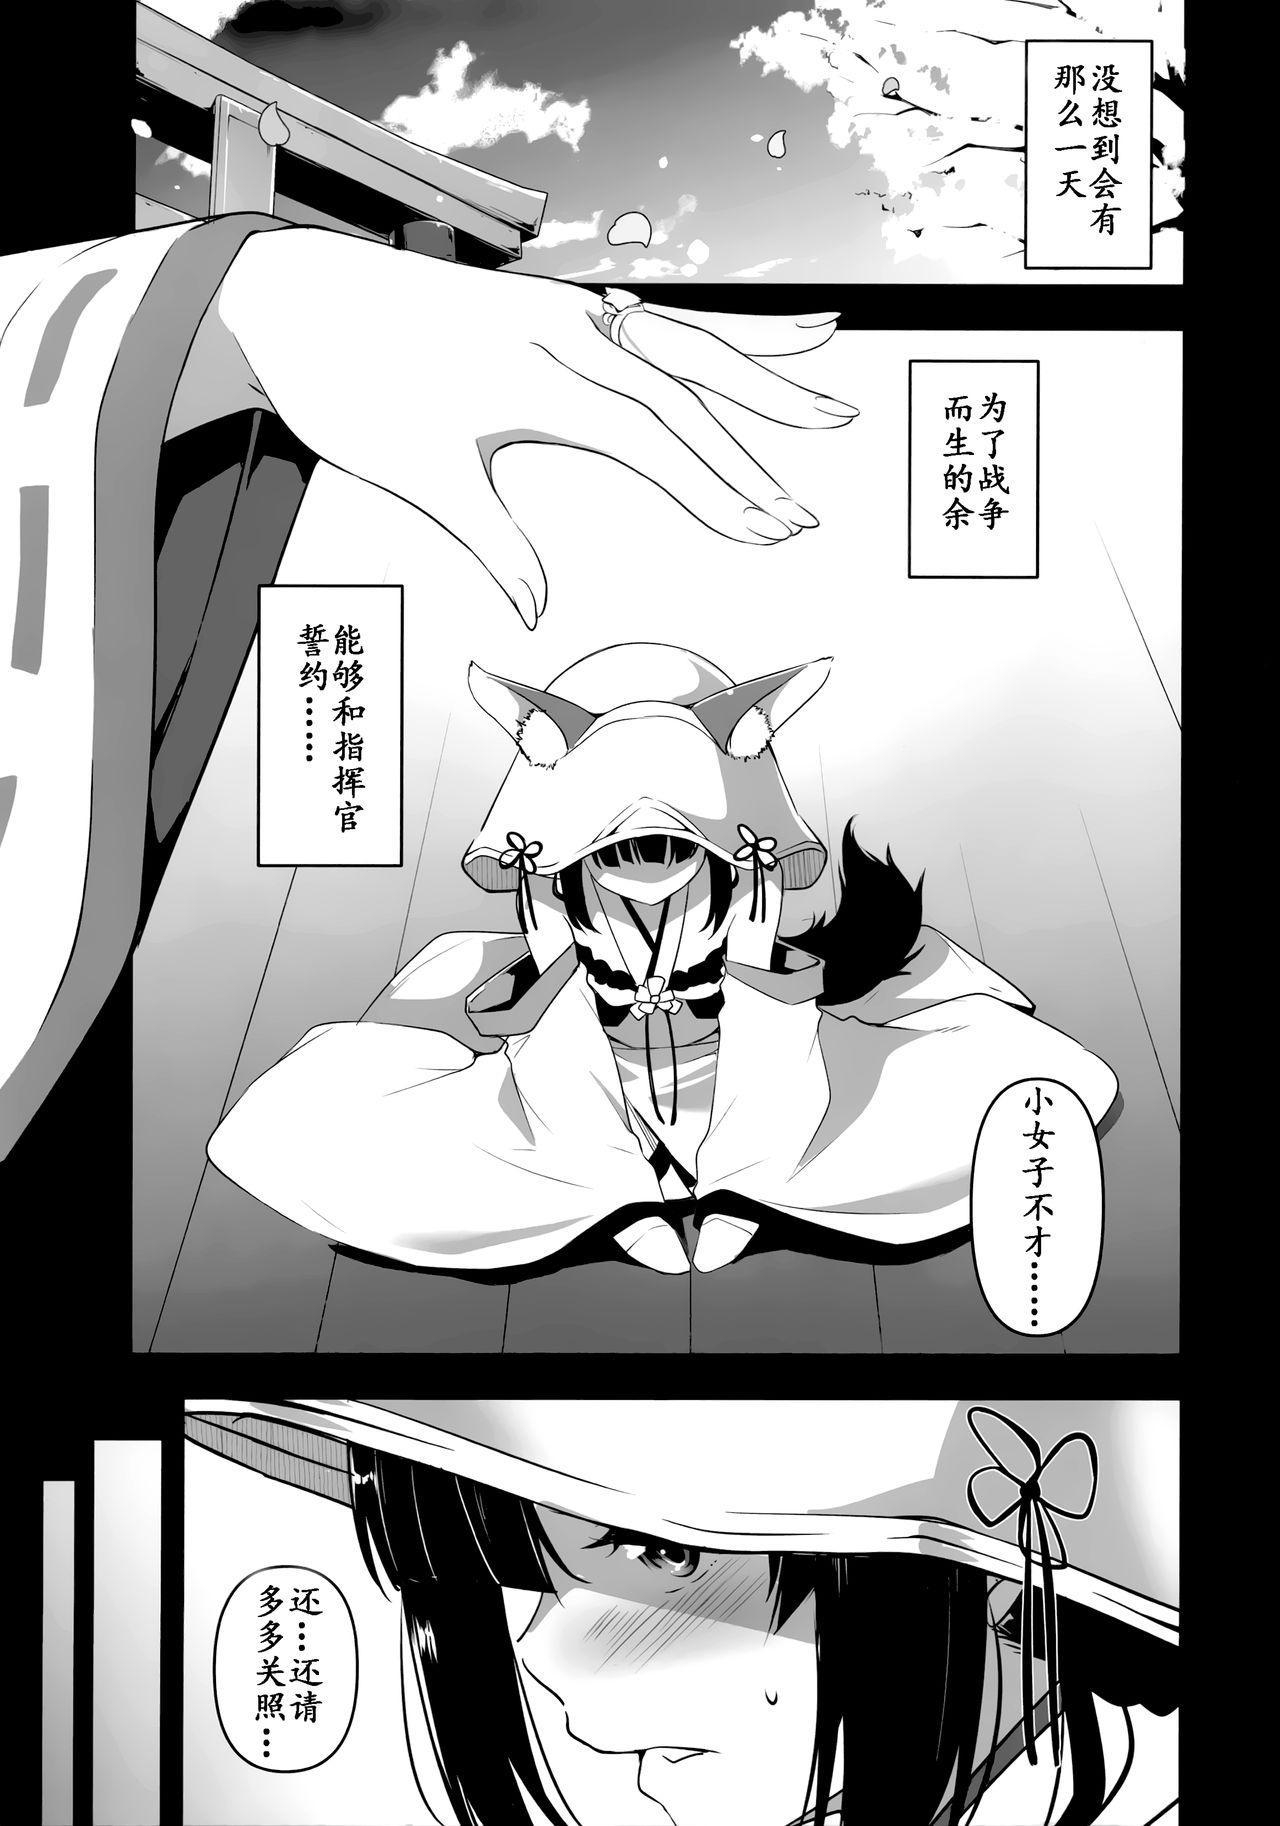 Nagato-chan no Hanayome Shugyou | 长门酱的花嫁修行 3